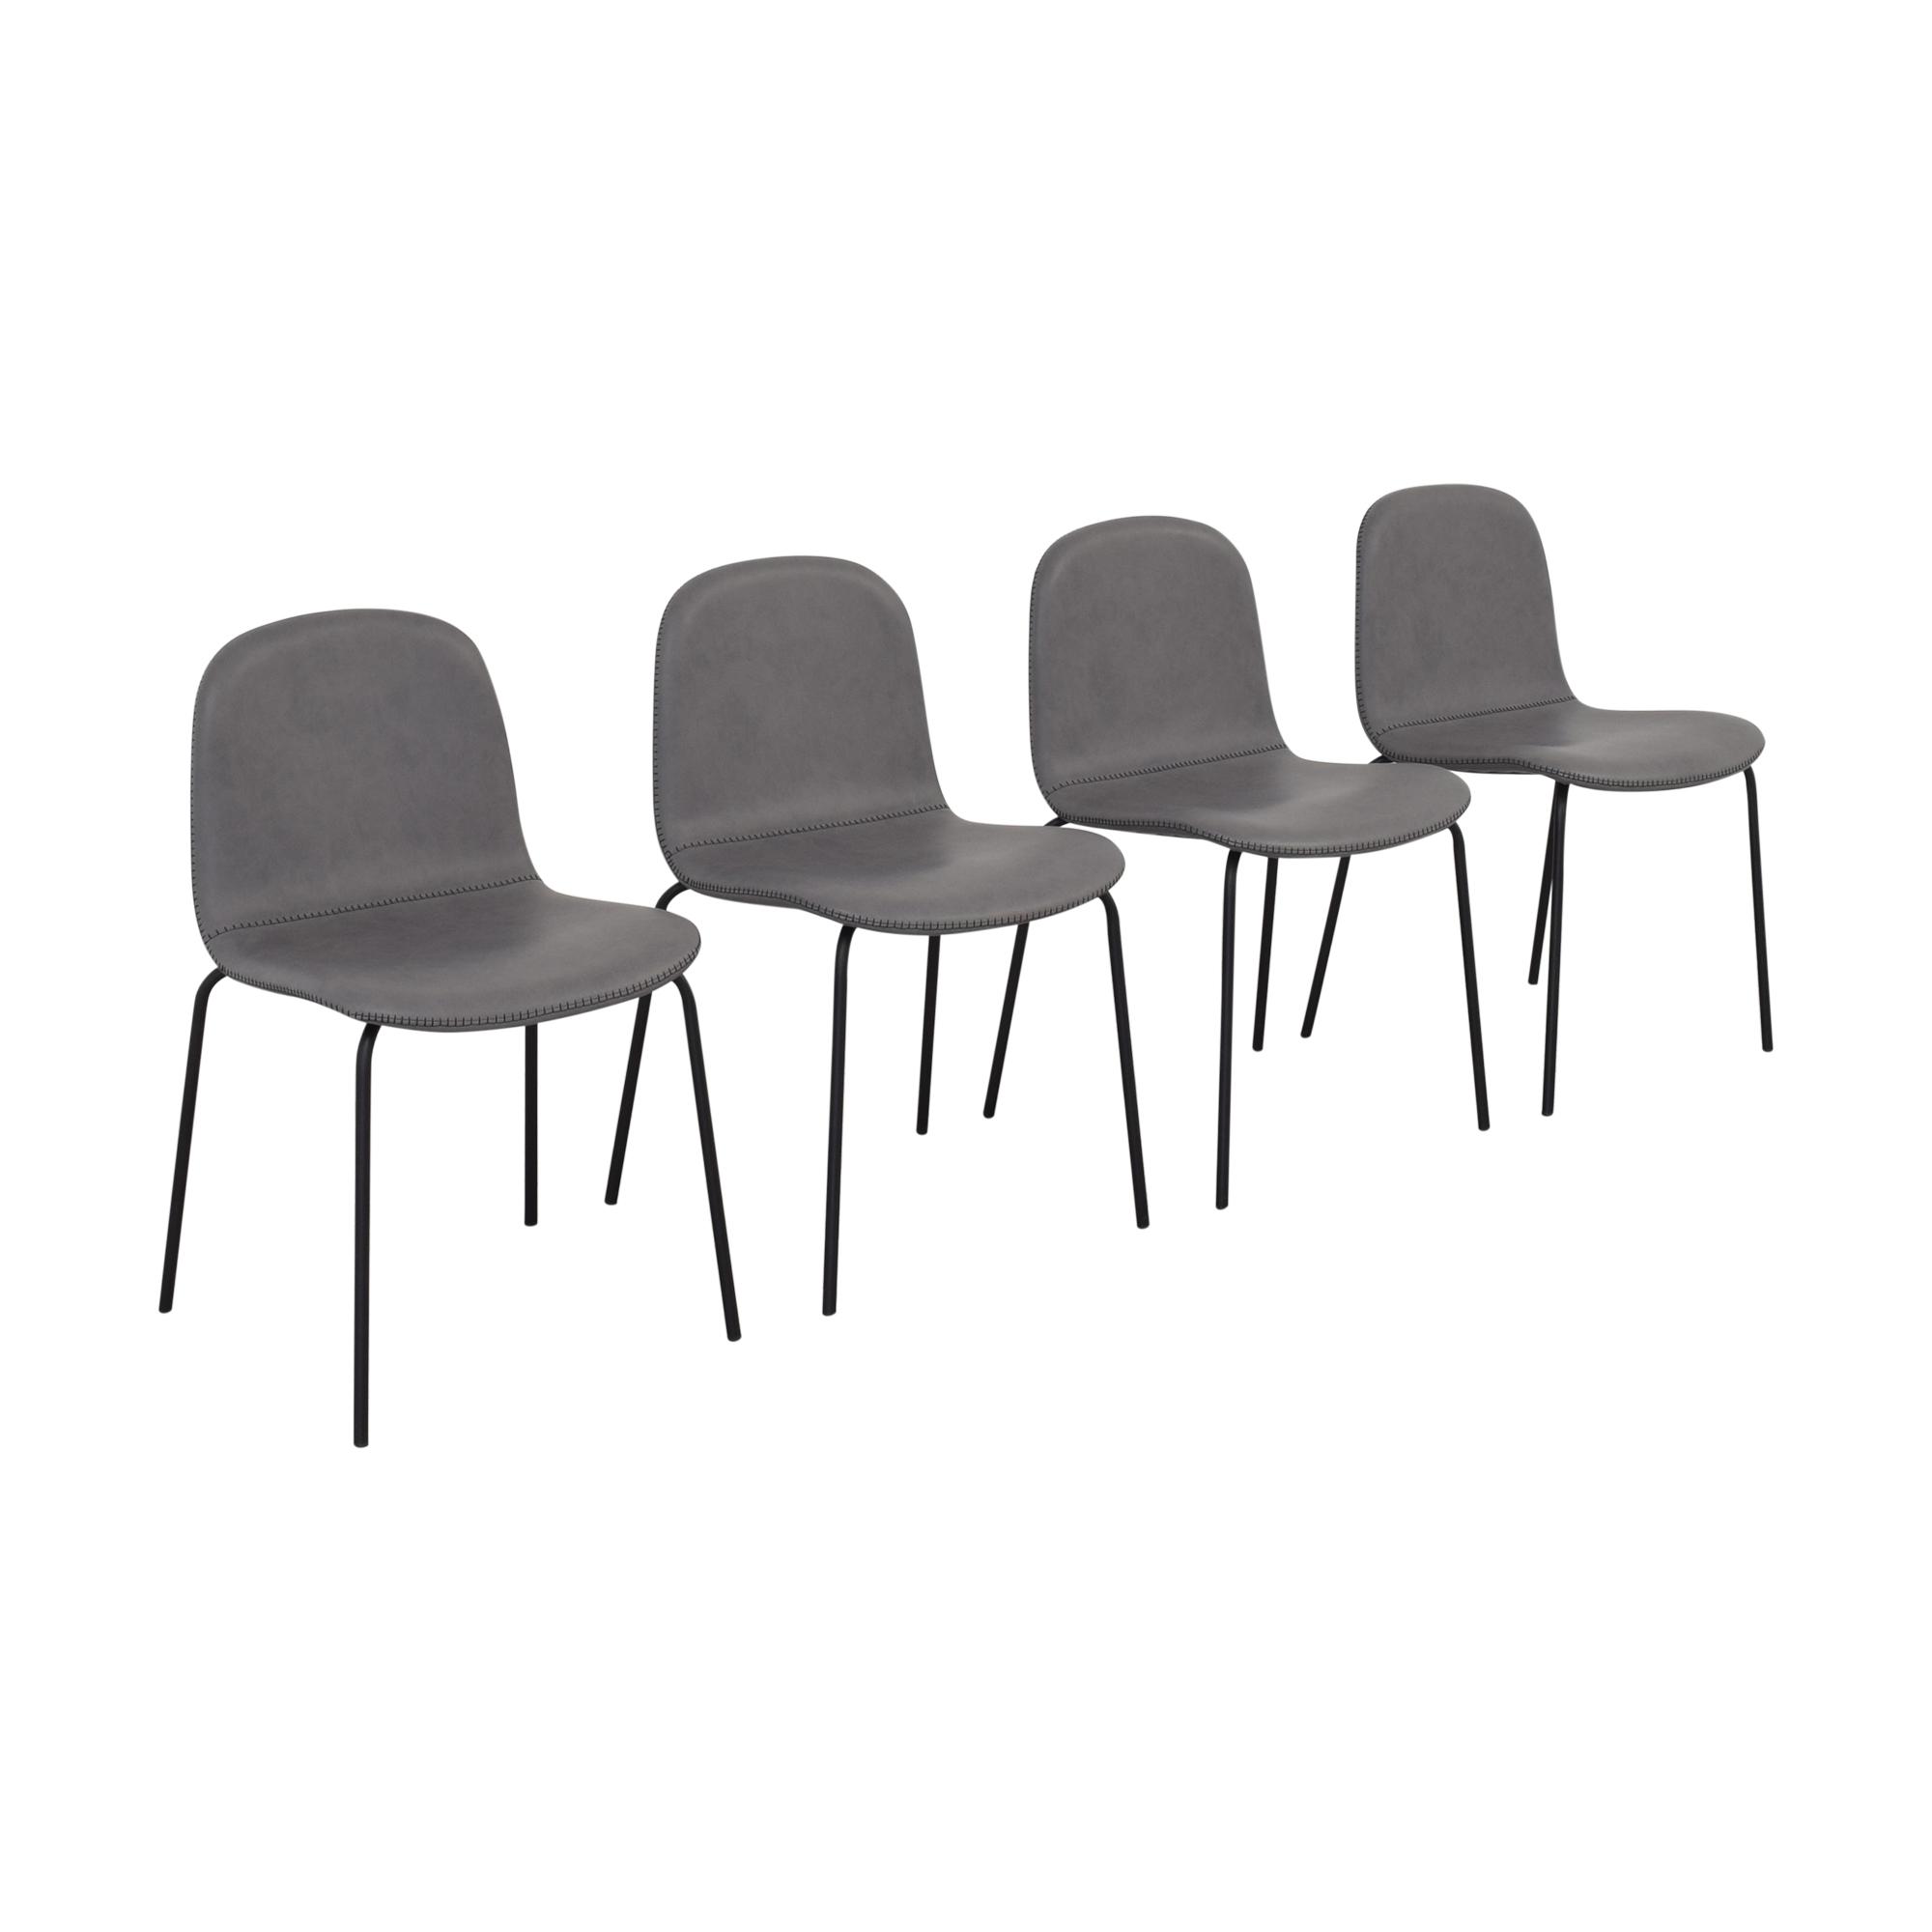 CB2 CB2 Primitivo Grey Chairs Chairs